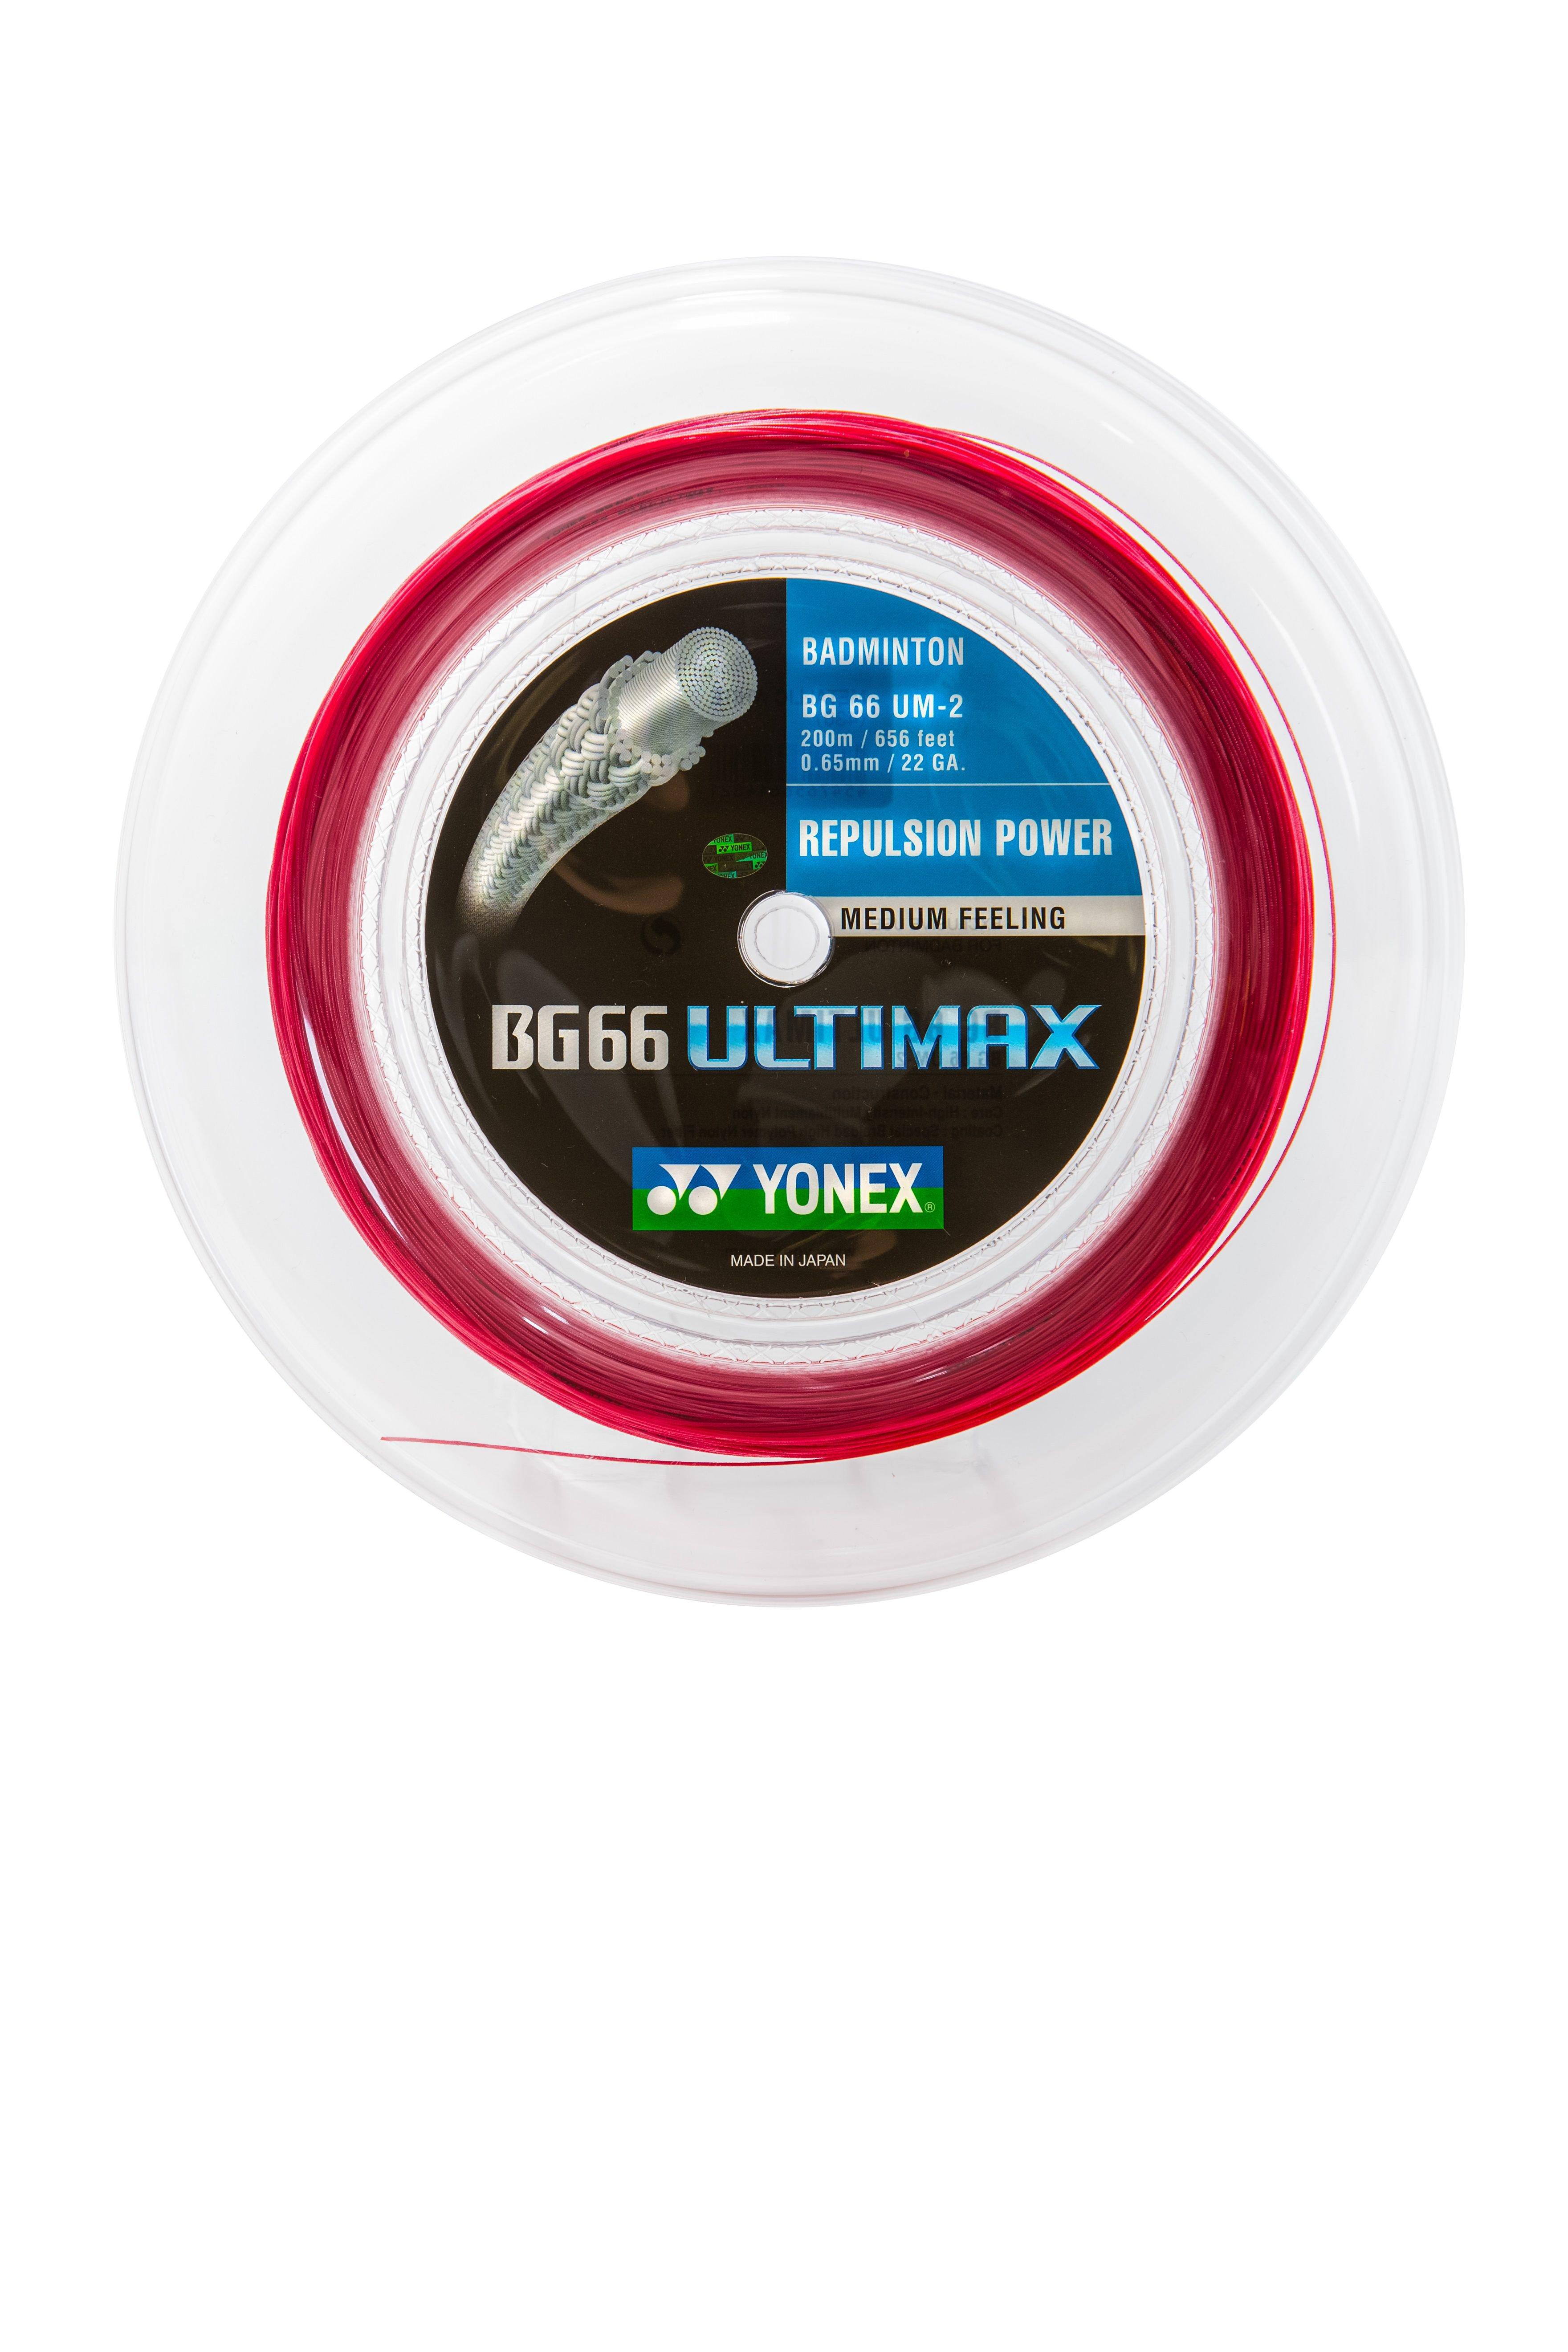 Yonex BG-66 ULTIMAX Badmintonstring red